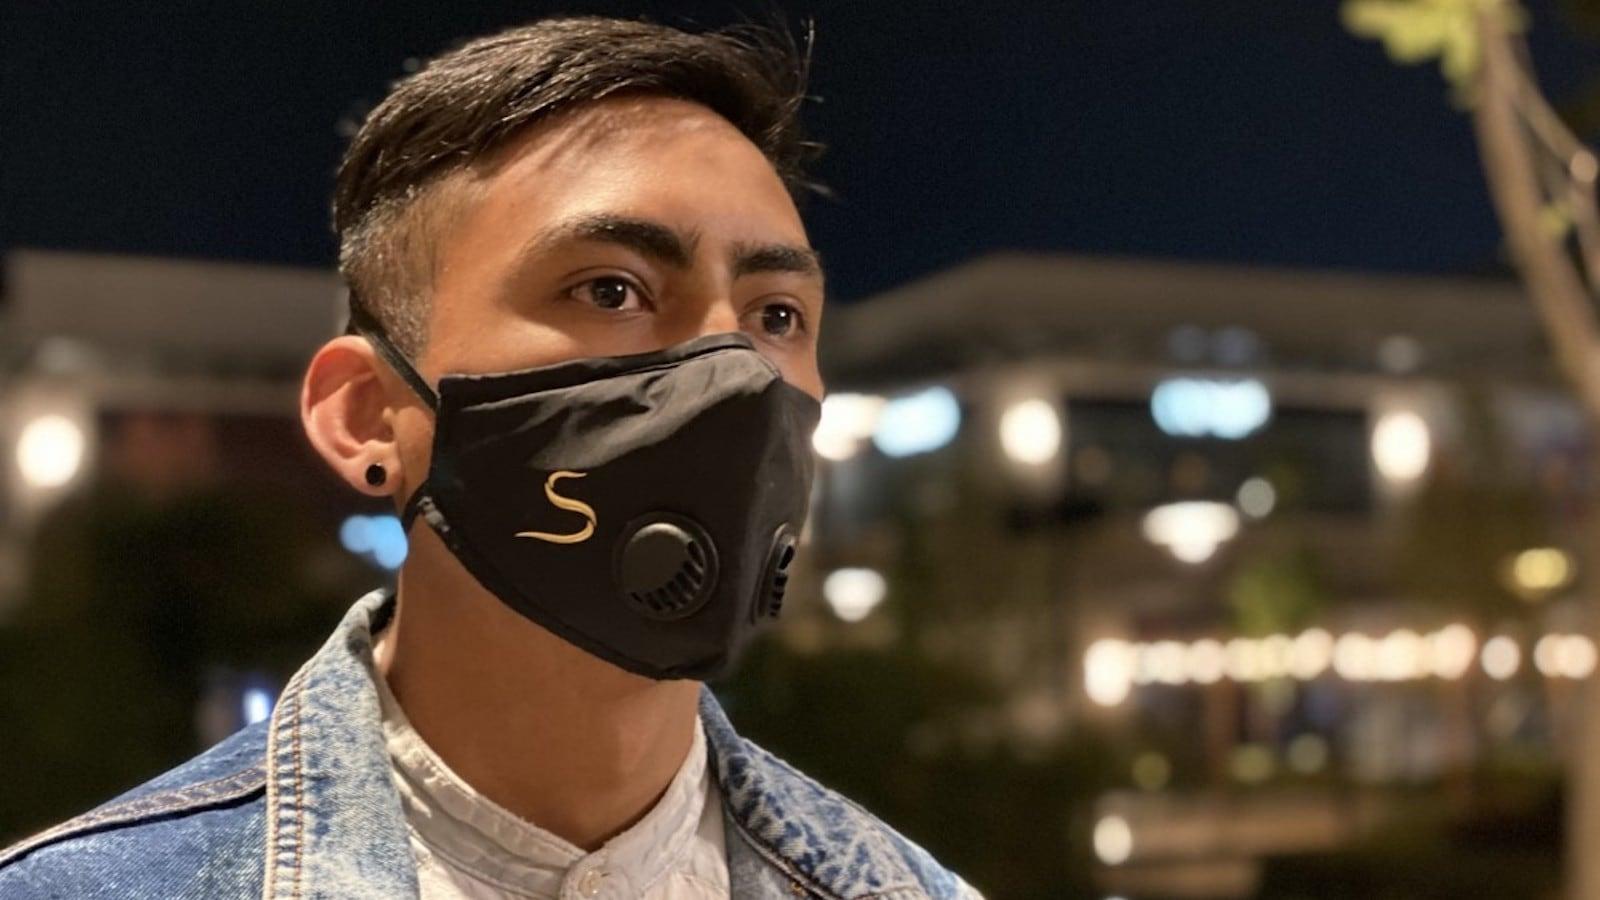 CSC01 Copper Shield elegant face mask comes in 3 different designs